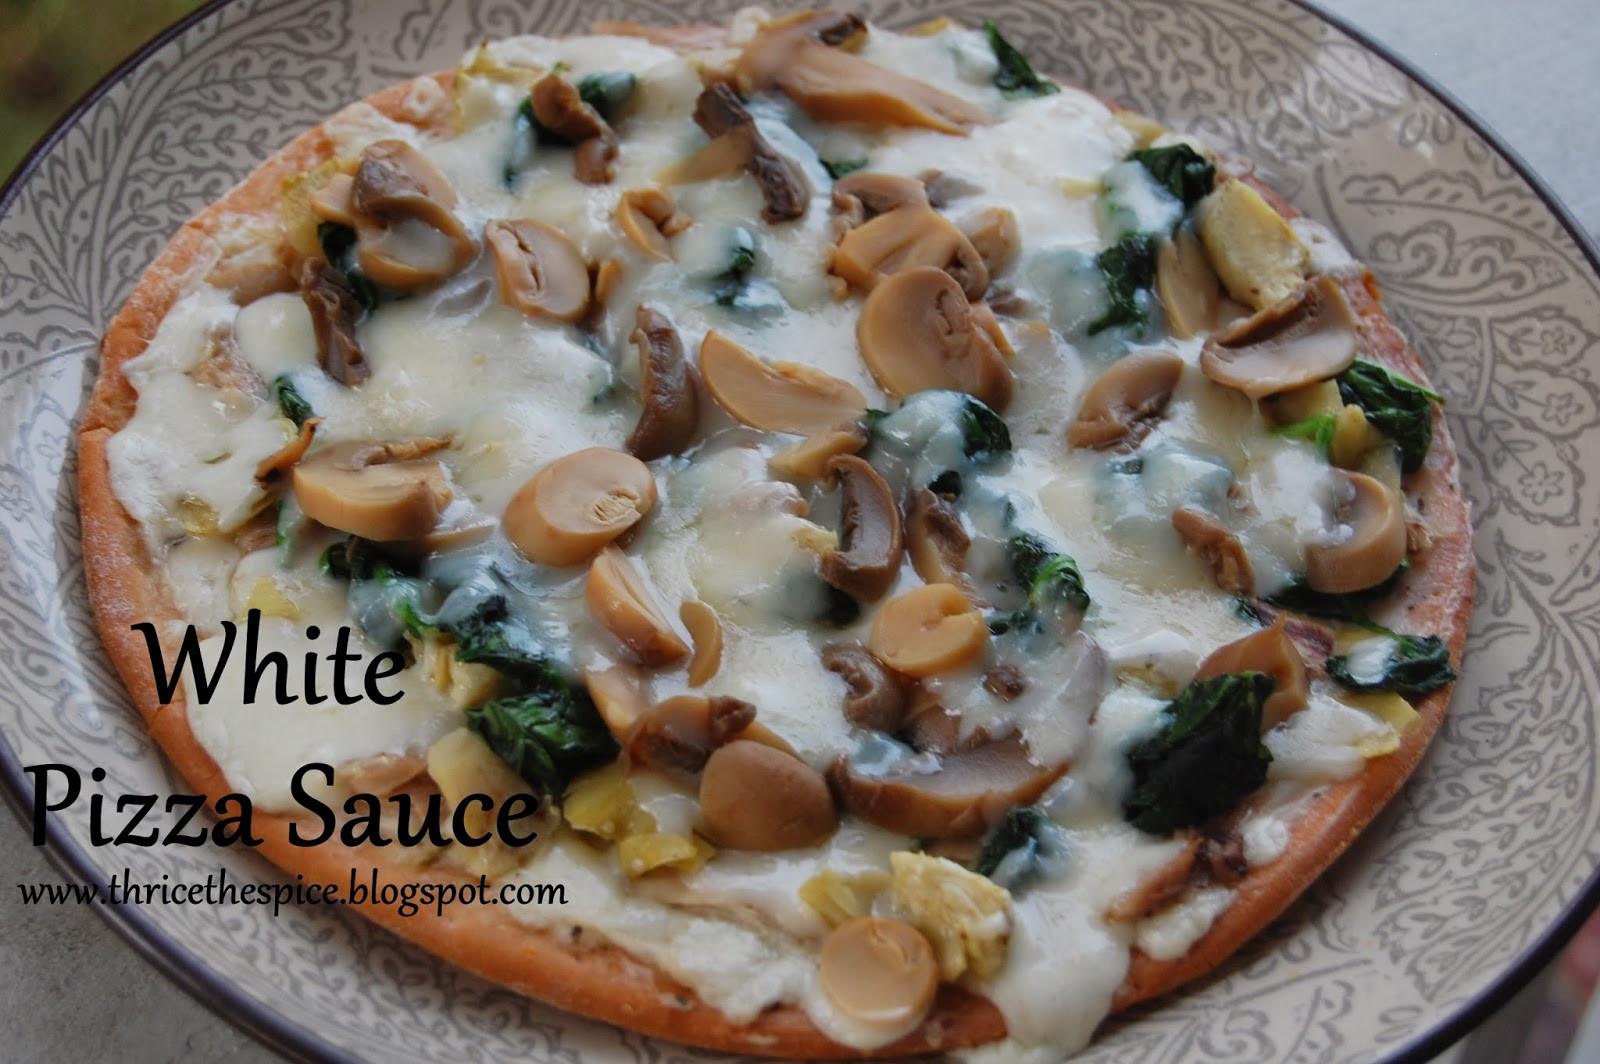 White Pizza Sauce  ThriceTheSpice White Pizza Sauce